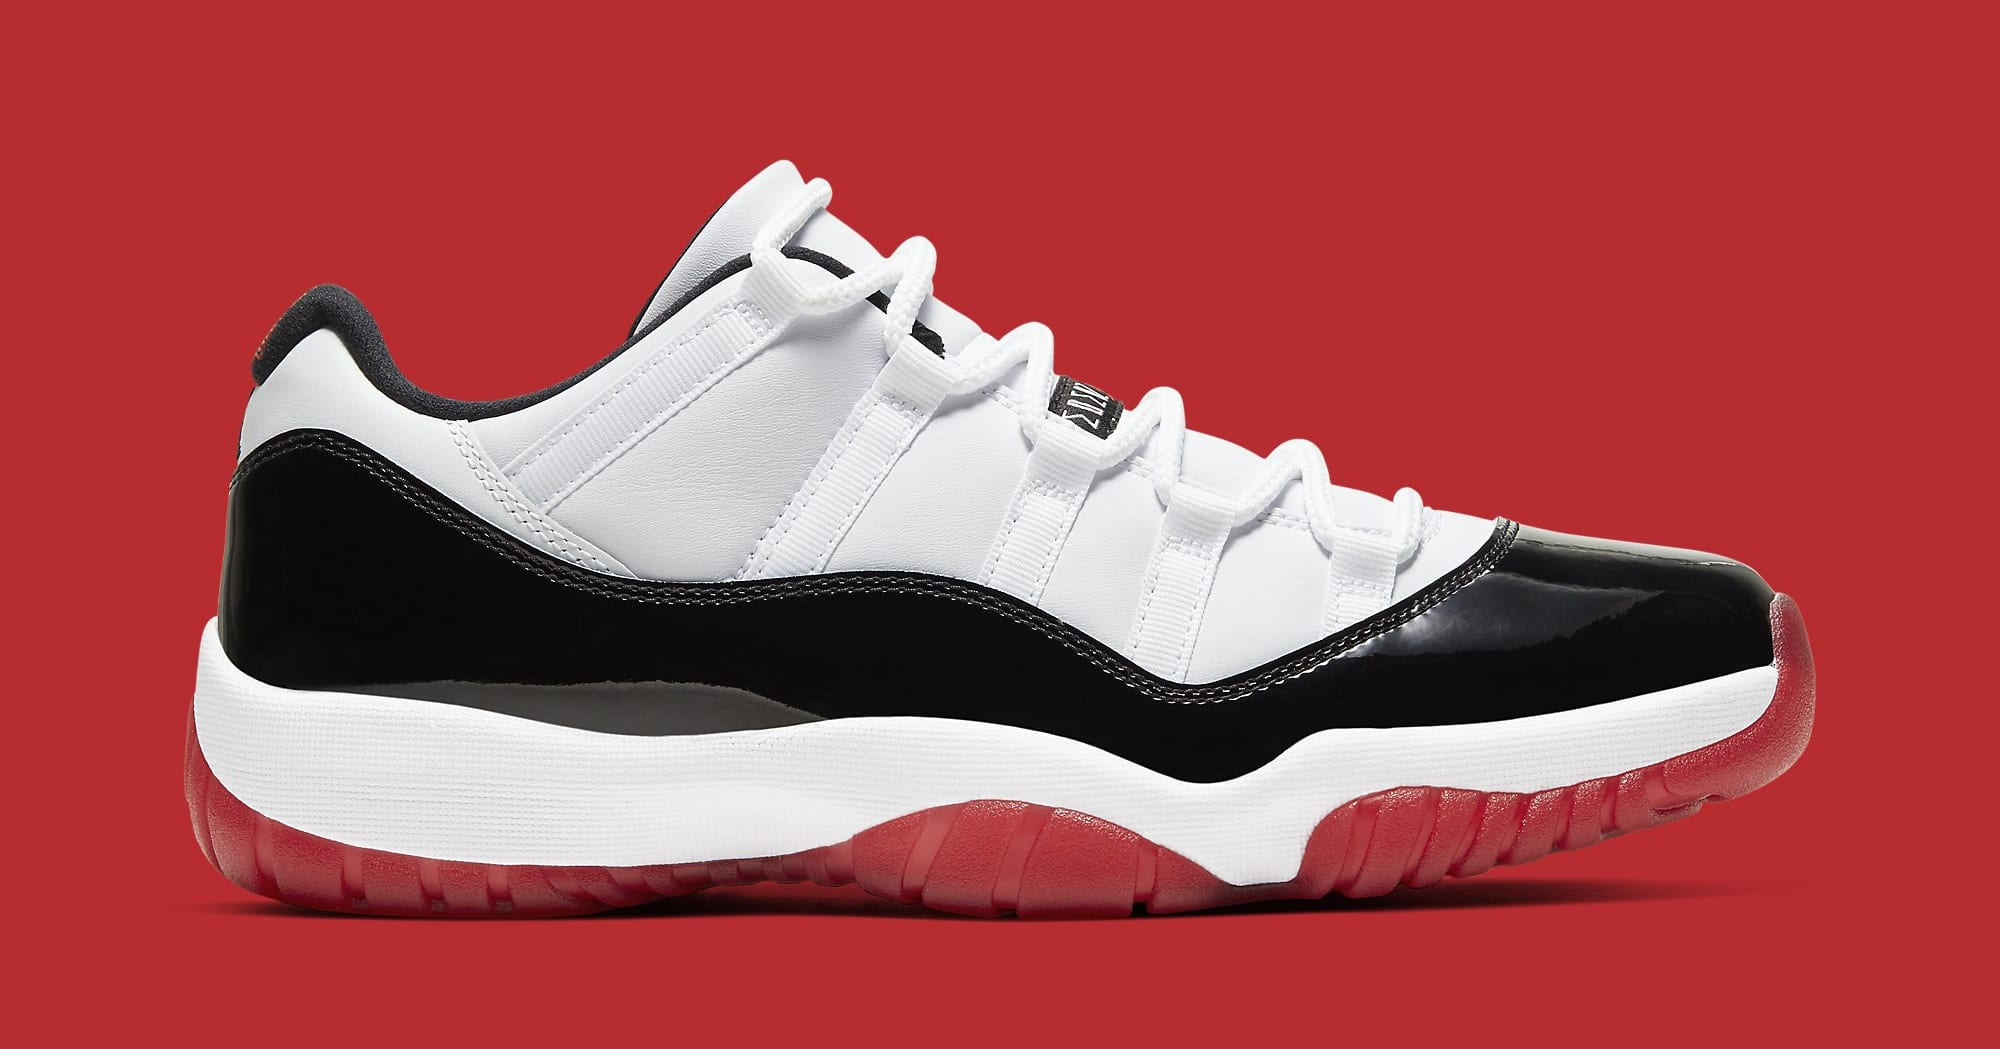 Air Jordan 11 Low White University Red Black True Red Av2187 160 Sole Collector